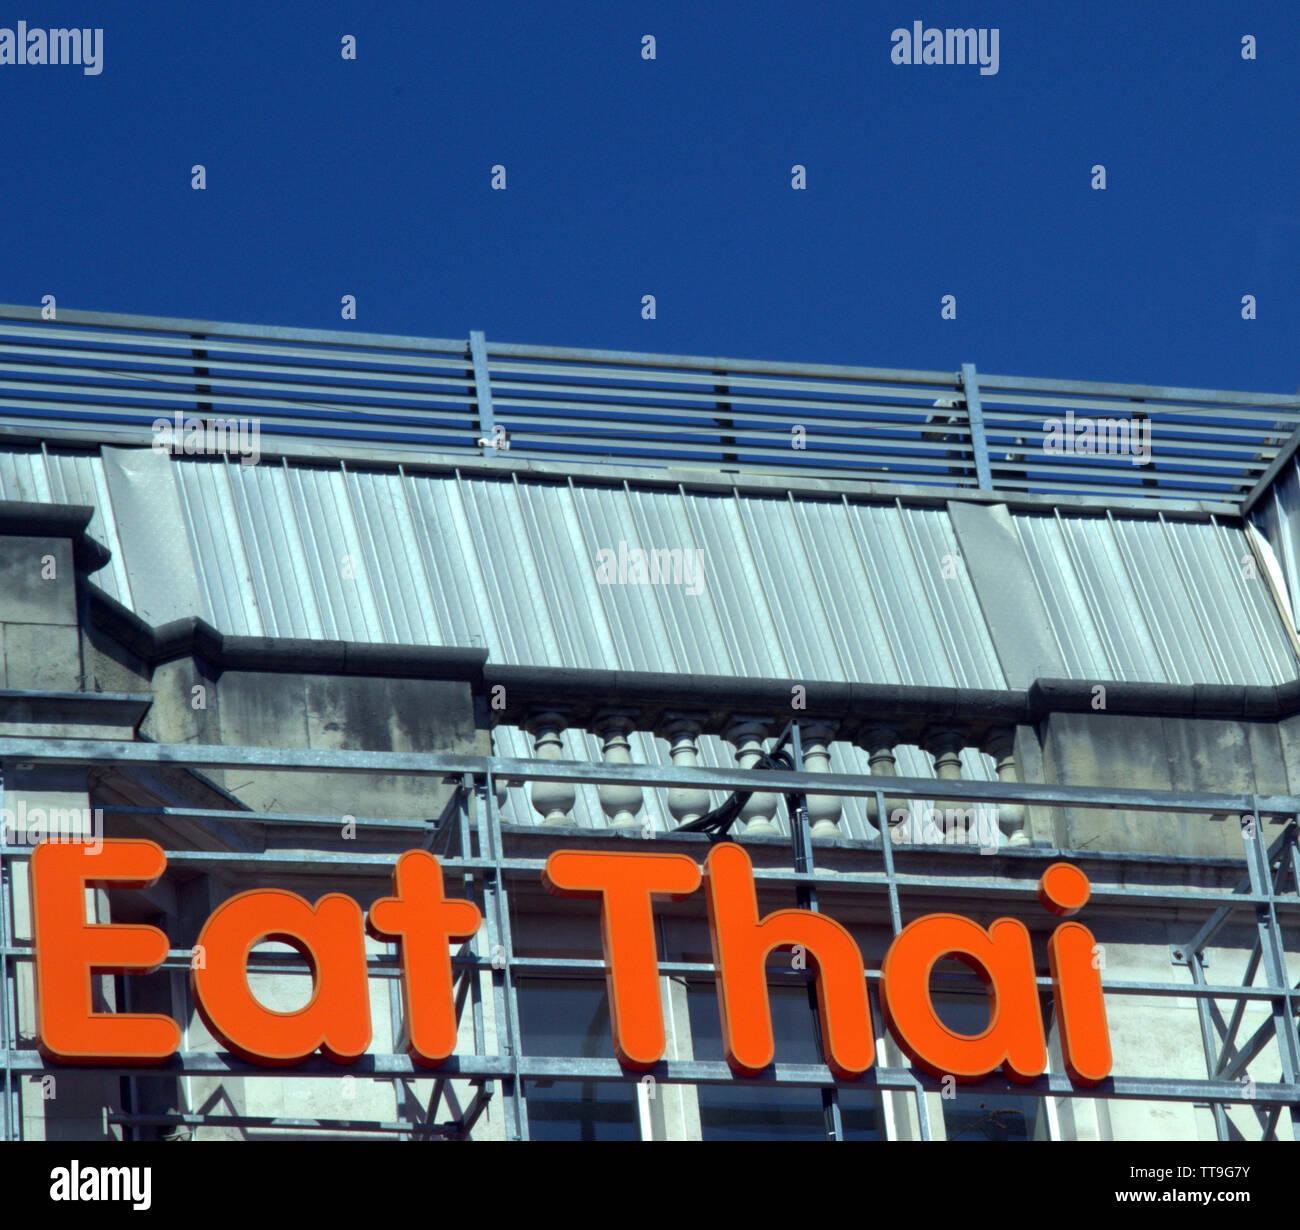 An 'Eat Thai' restaurant sign in city centre Manchester, uk - Stock Image